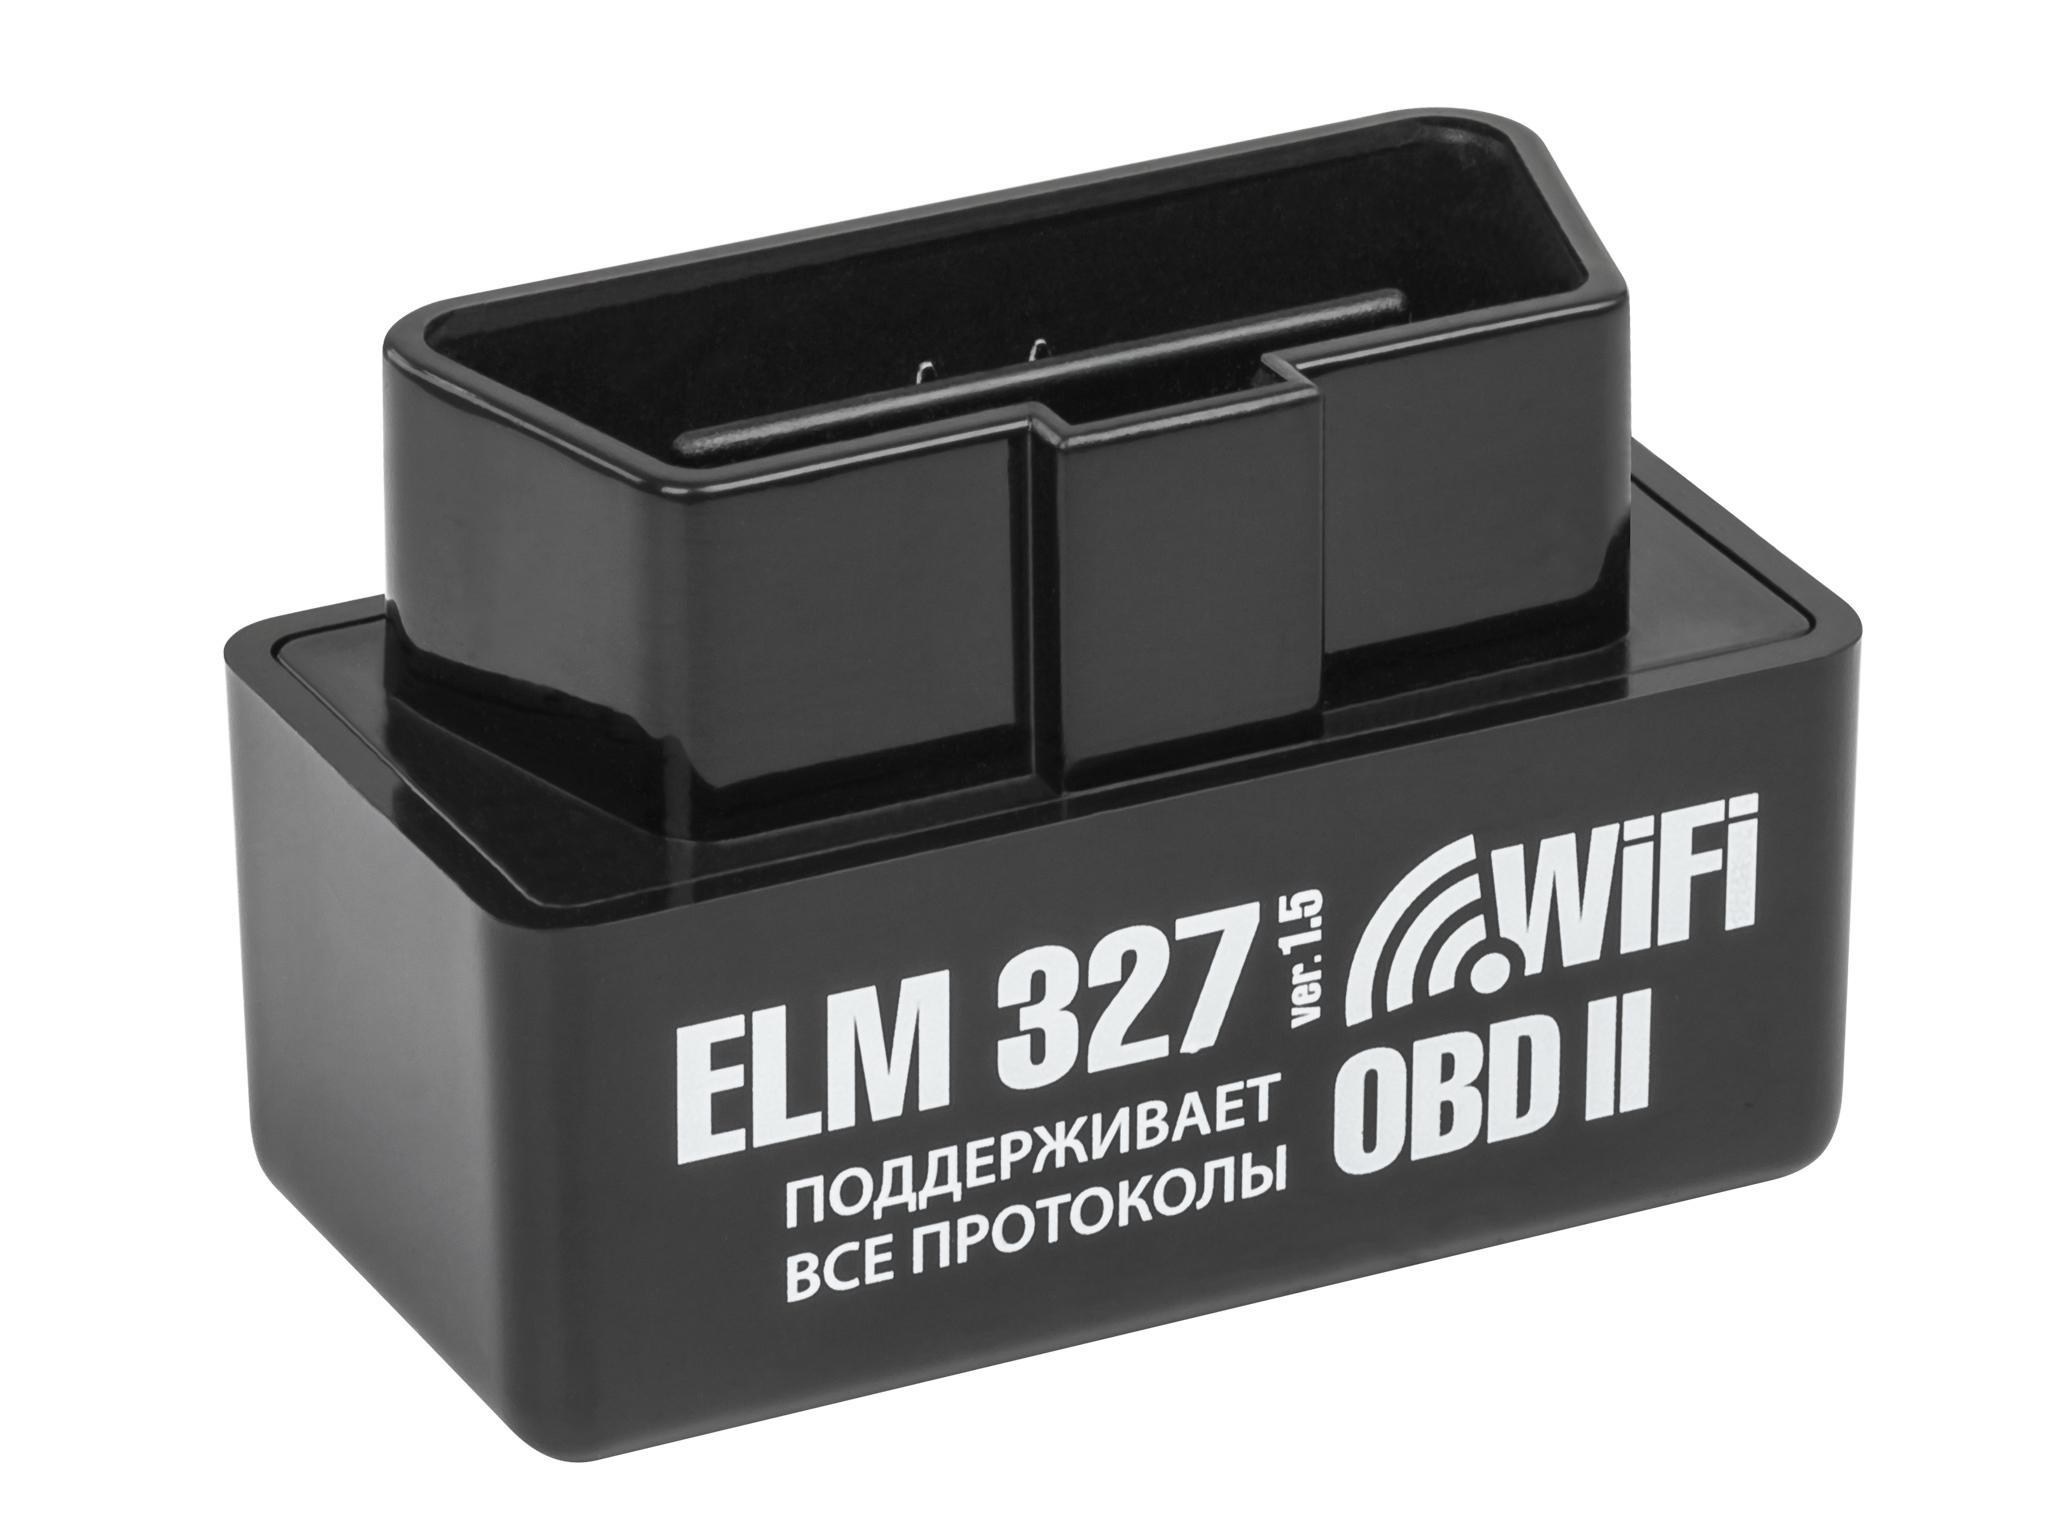 Адаптер Emitron Elm327 wi-fi